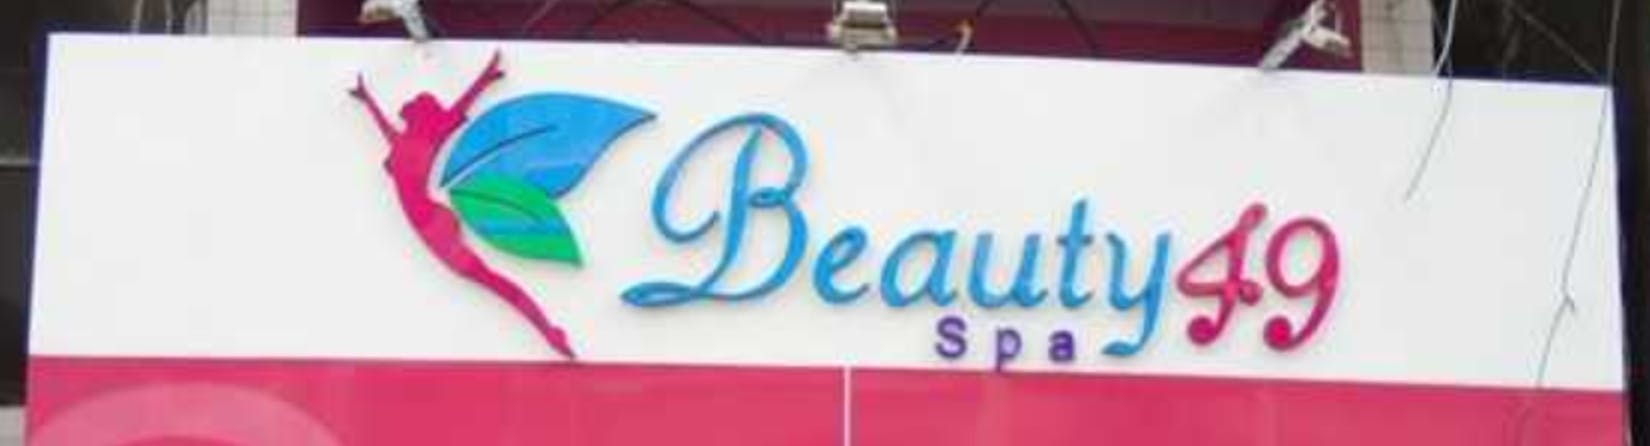 Beauty 49 Spa   Beauty